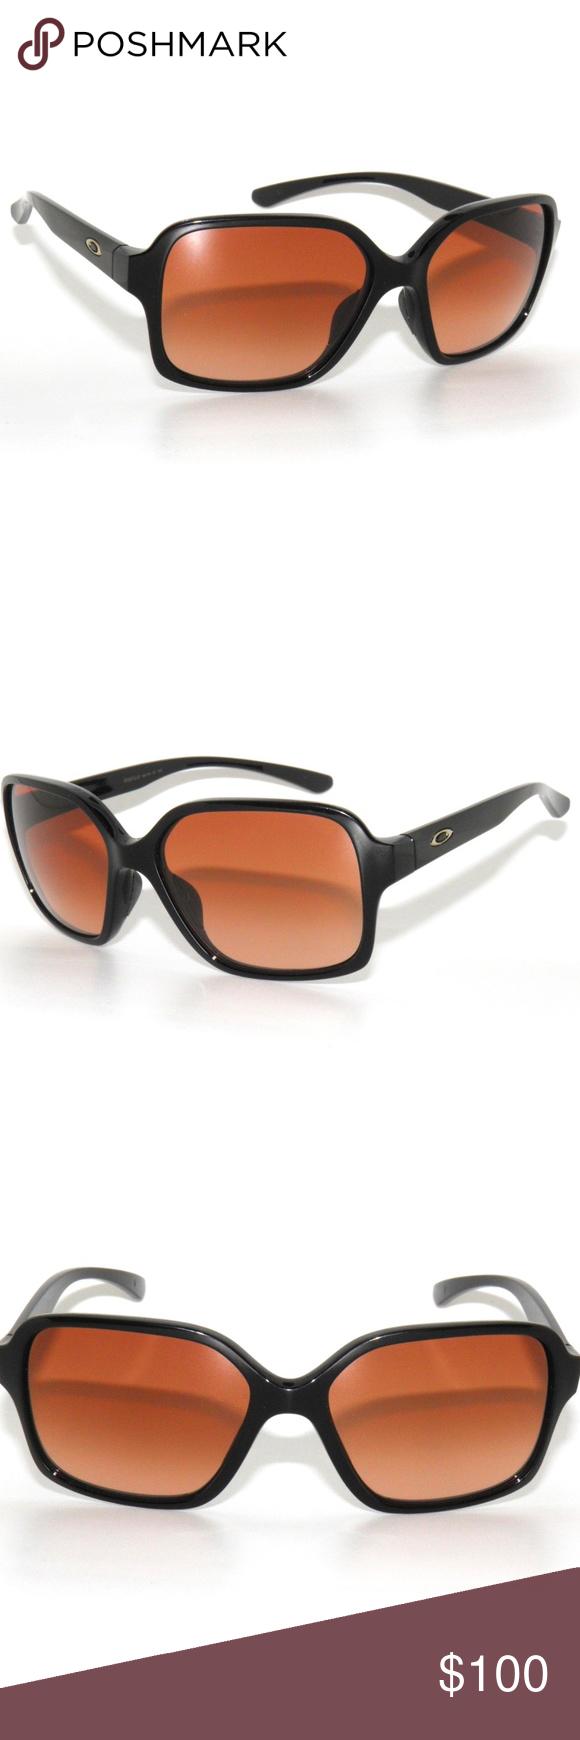 eb886830b12 Oakley Proxy Sunglasses 9312-01 NWT